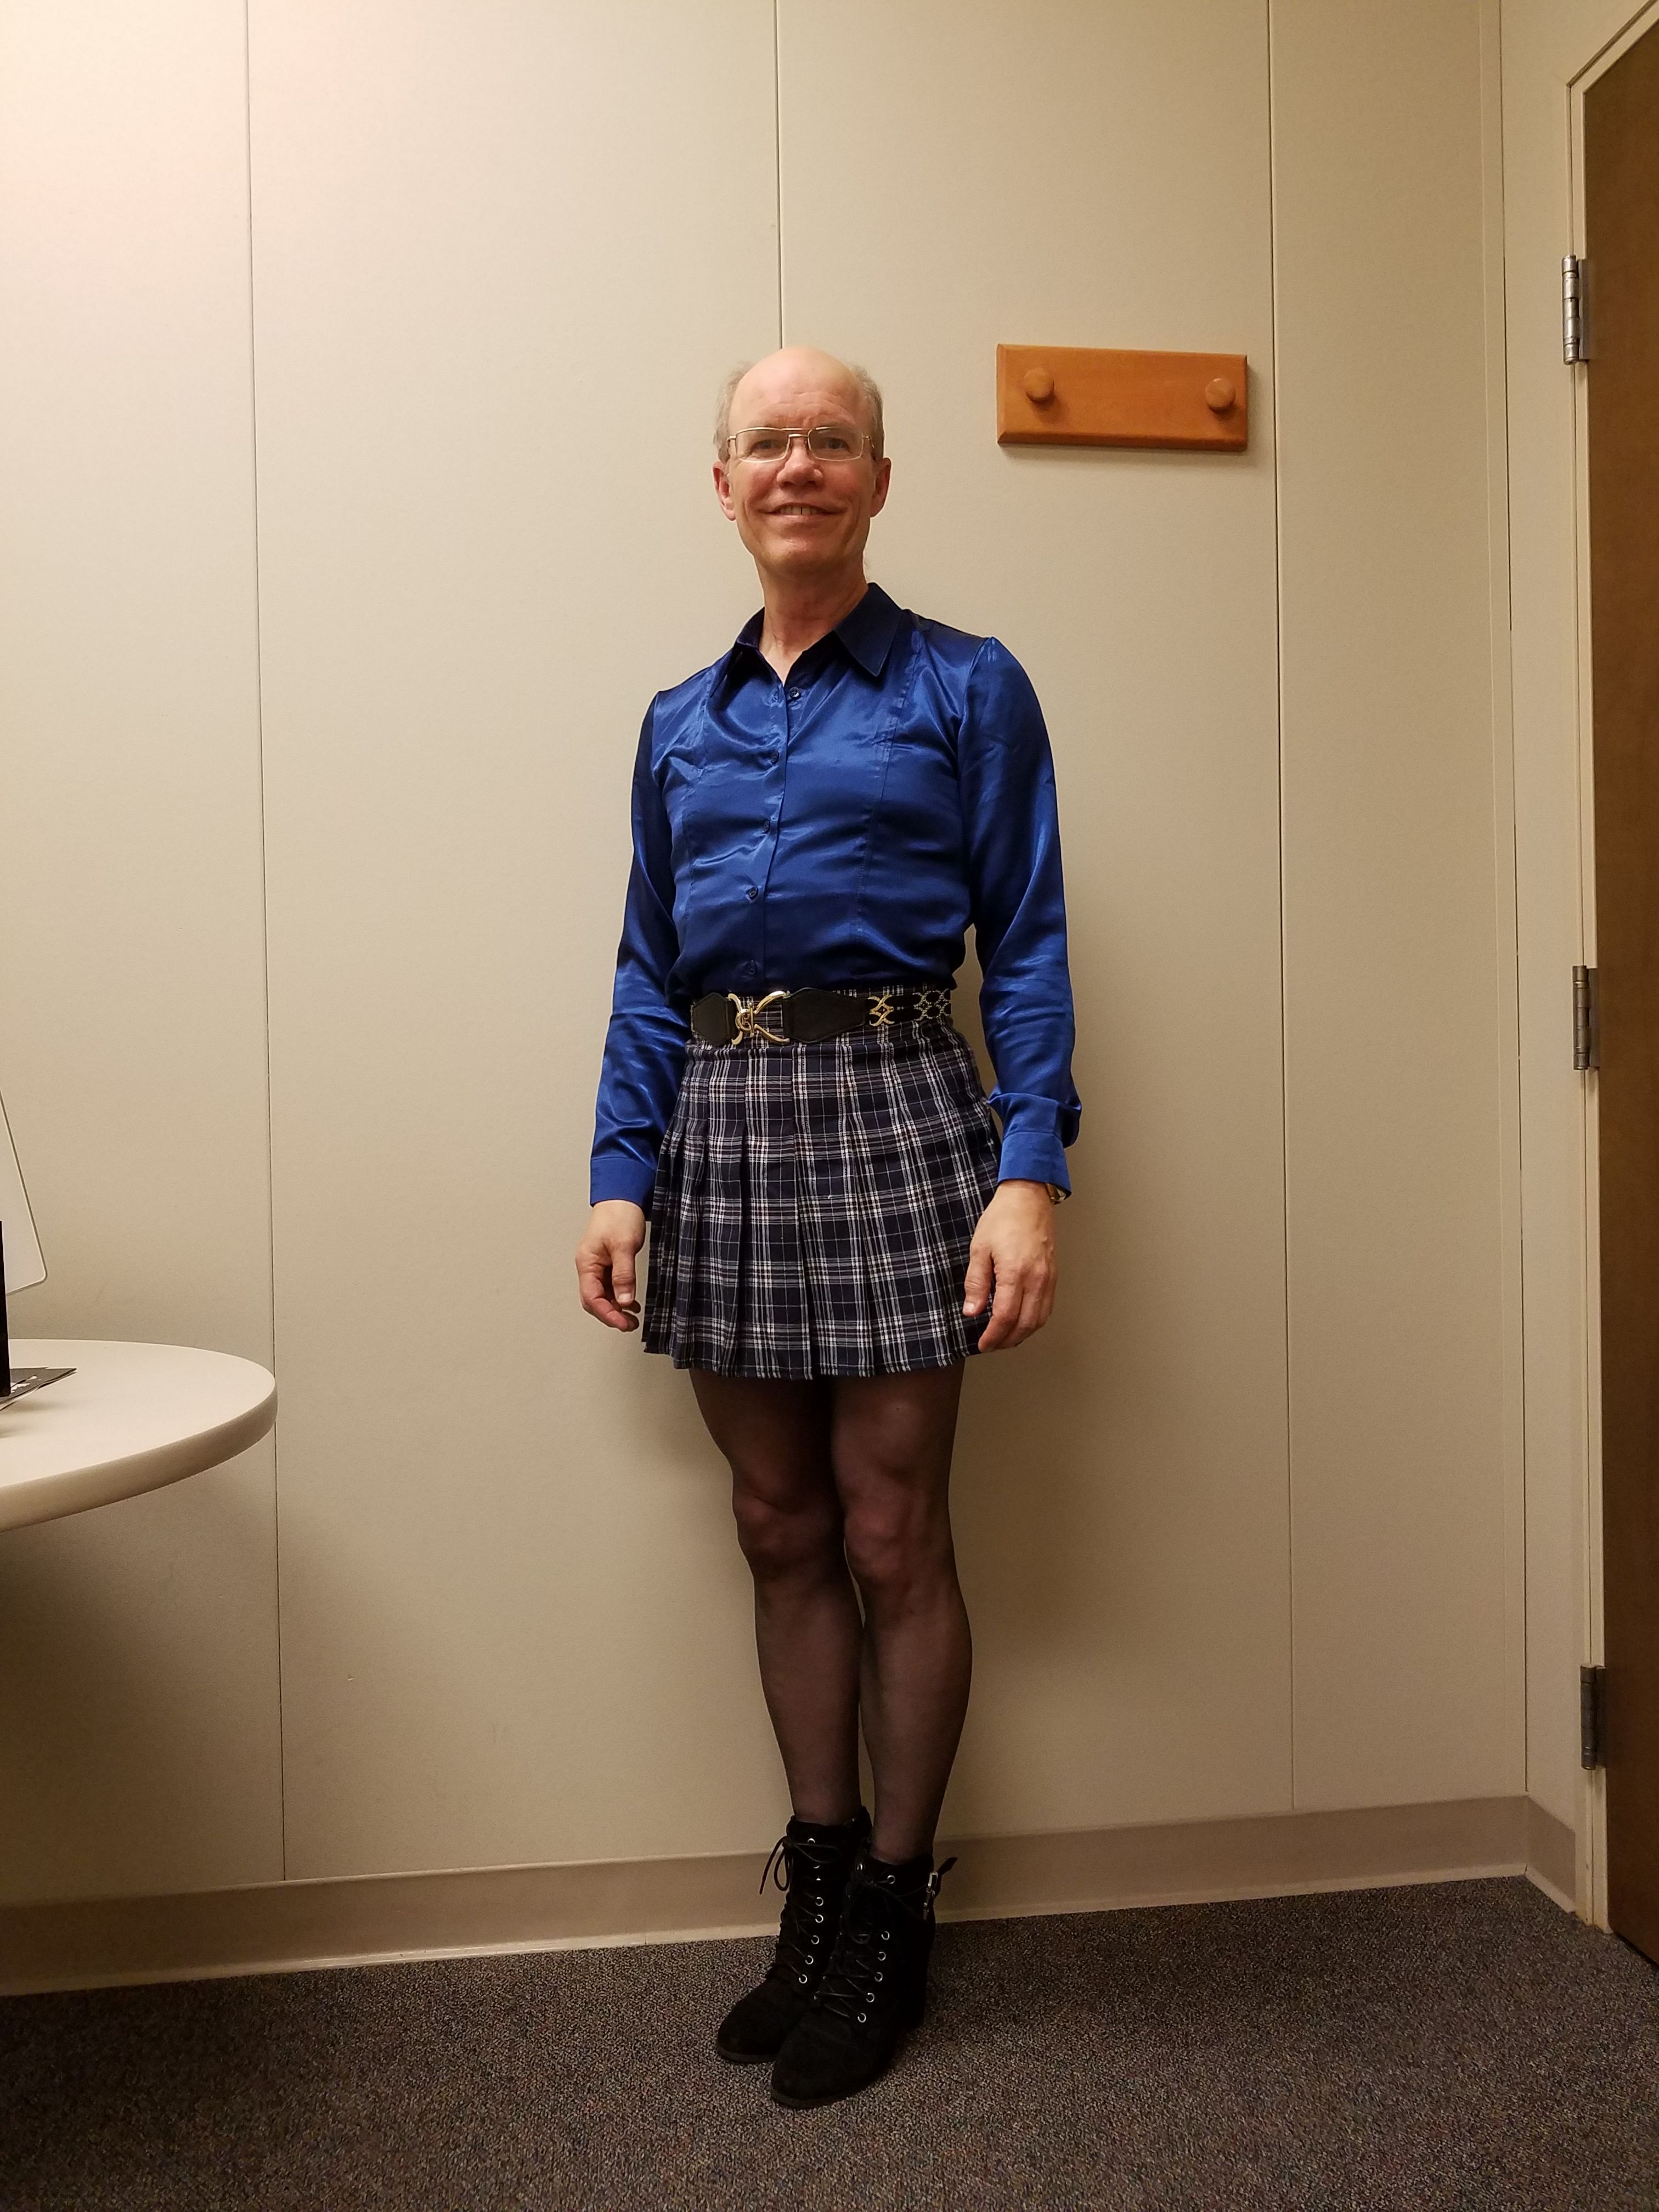 ff6f75b066 Blue plaid pleated mini skirt (AliExpress), blue satin silk shirt  (AliExpress), black Donna Karan nylons, black chunk high heel shoes (DSW).